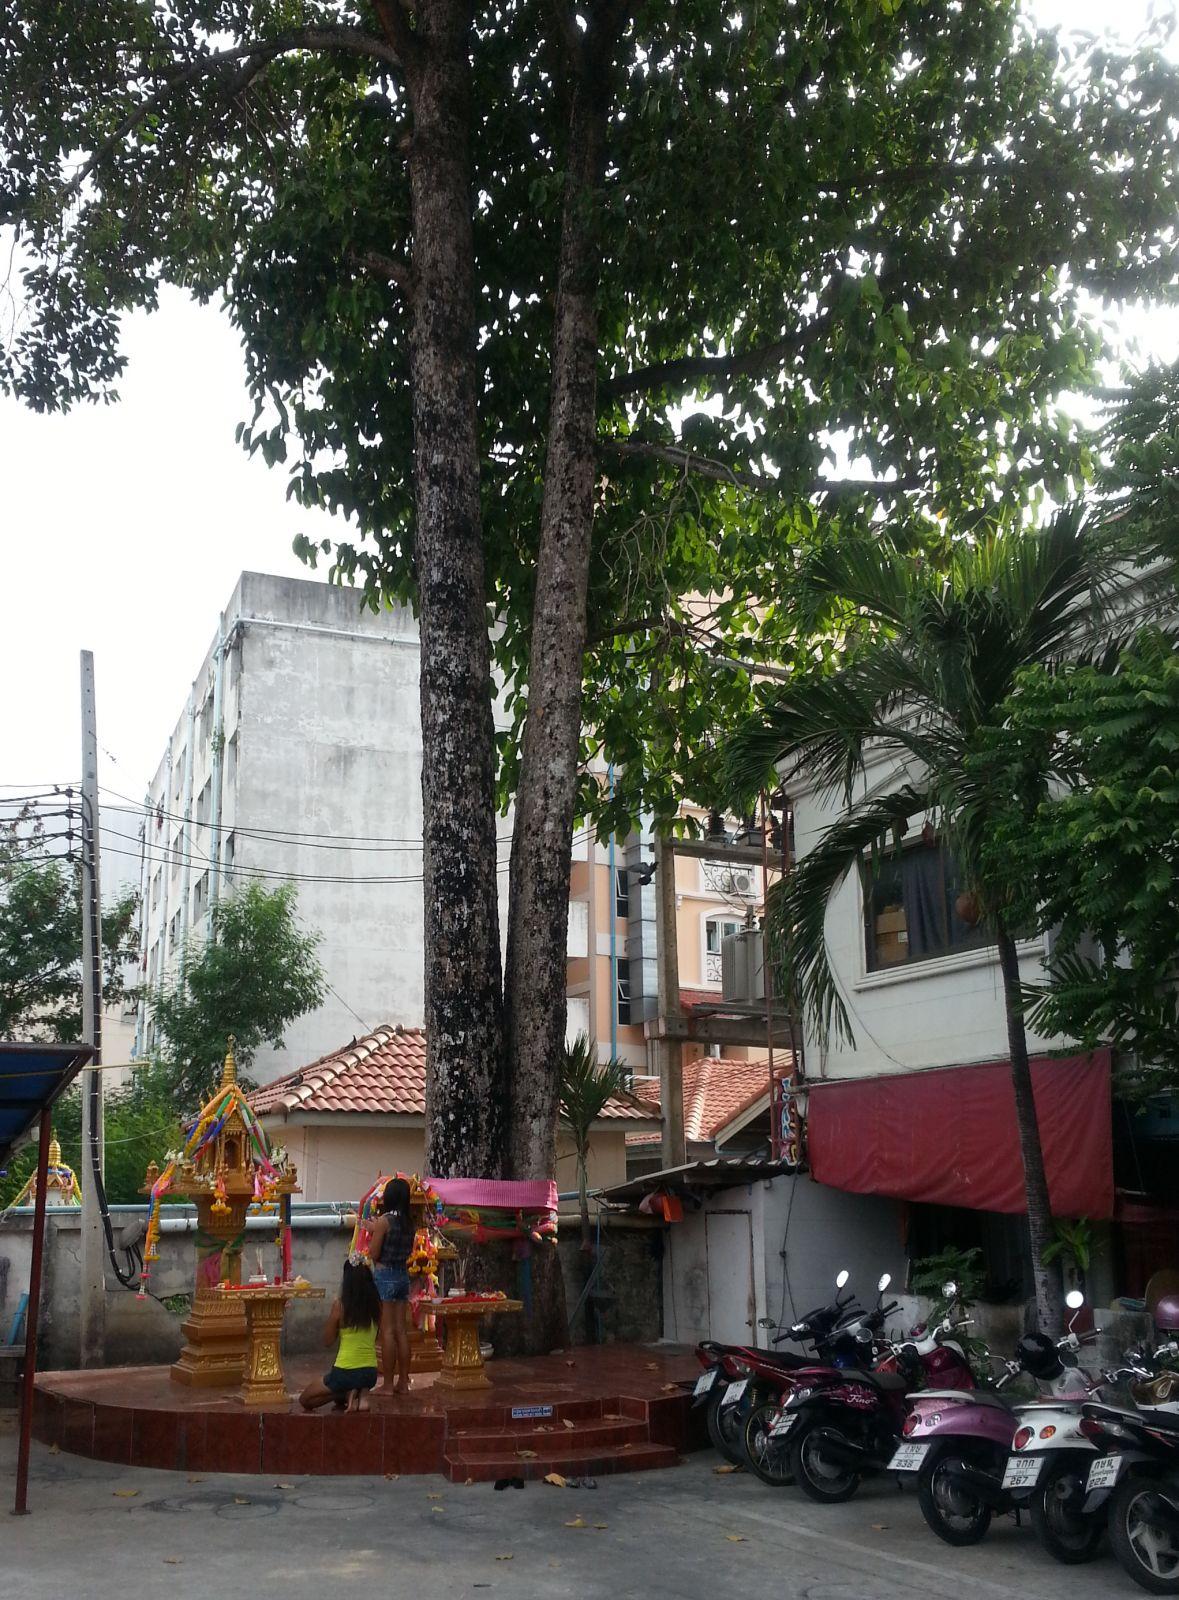 Puude austamine linnas